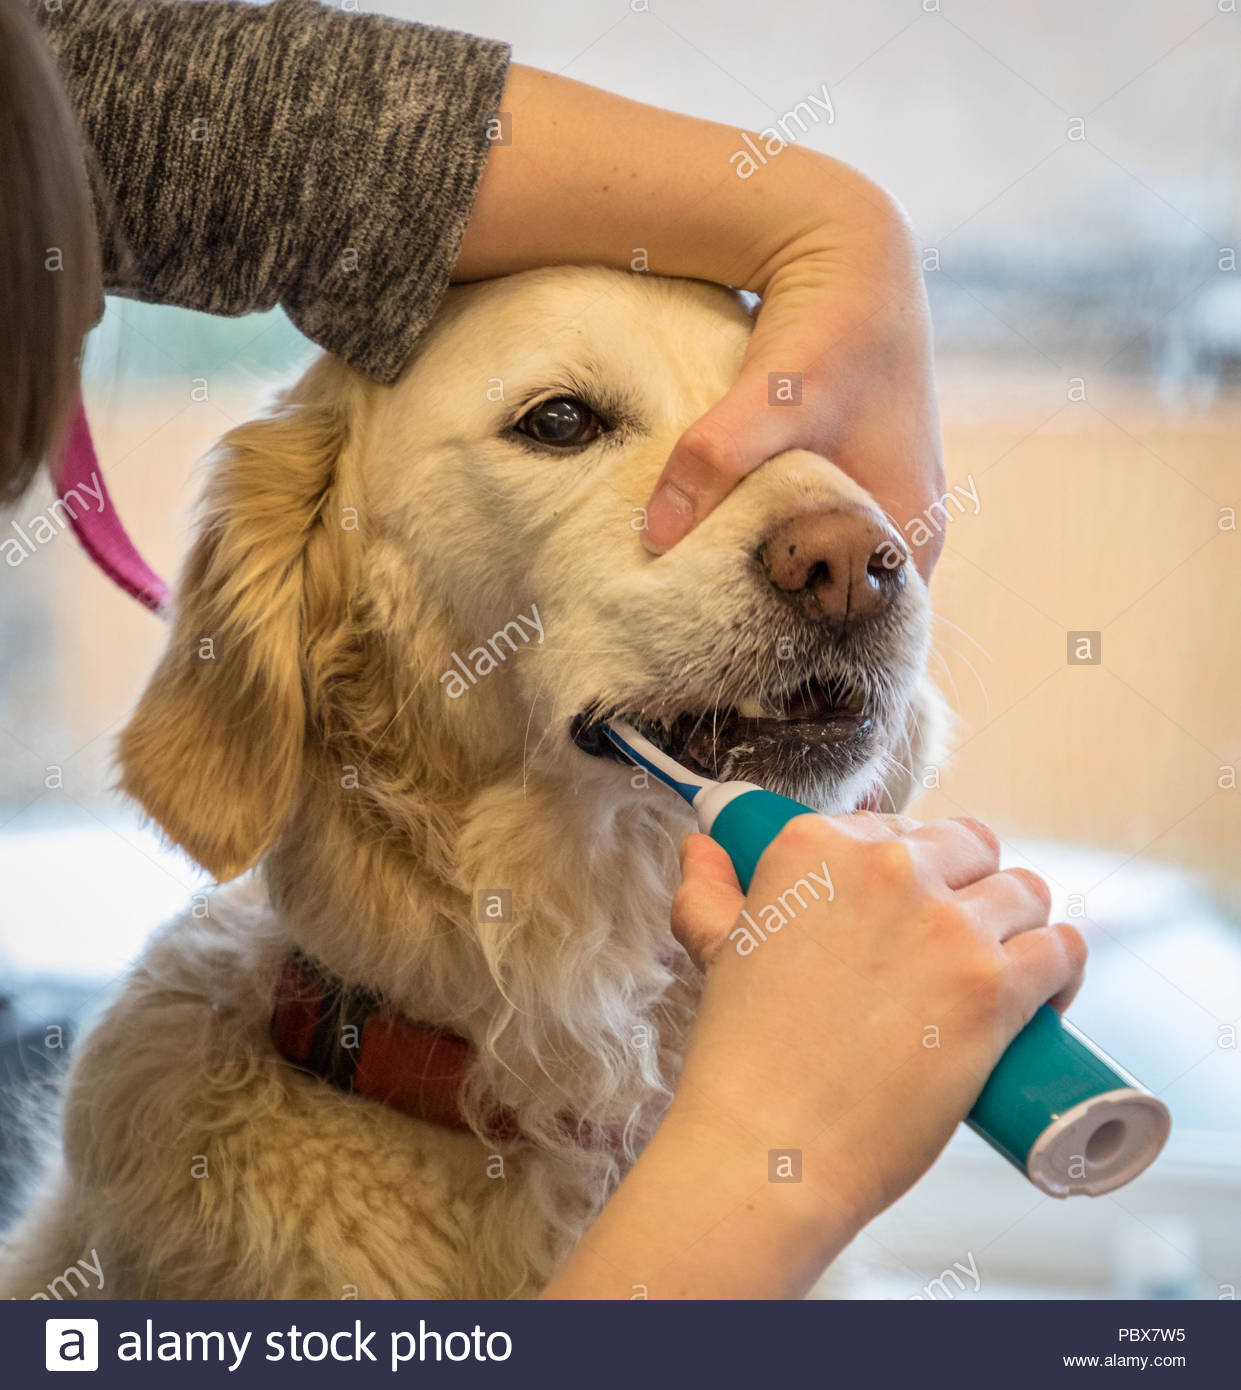 How to brush teeth dog Ultrasonic cleaning of teeth: reviews 16